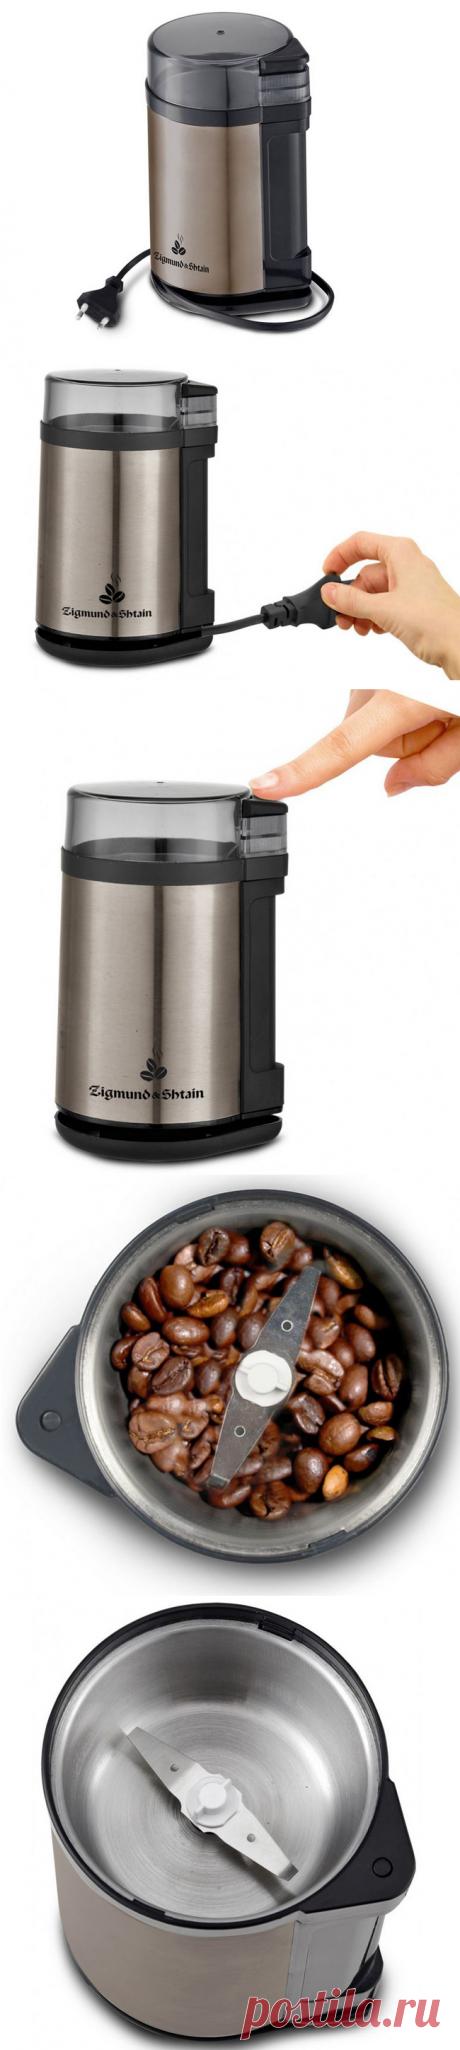 Кофемолка Zigmund & Shtain Al caffe ZCG-09 с Алиэкспресс | Super-Blog